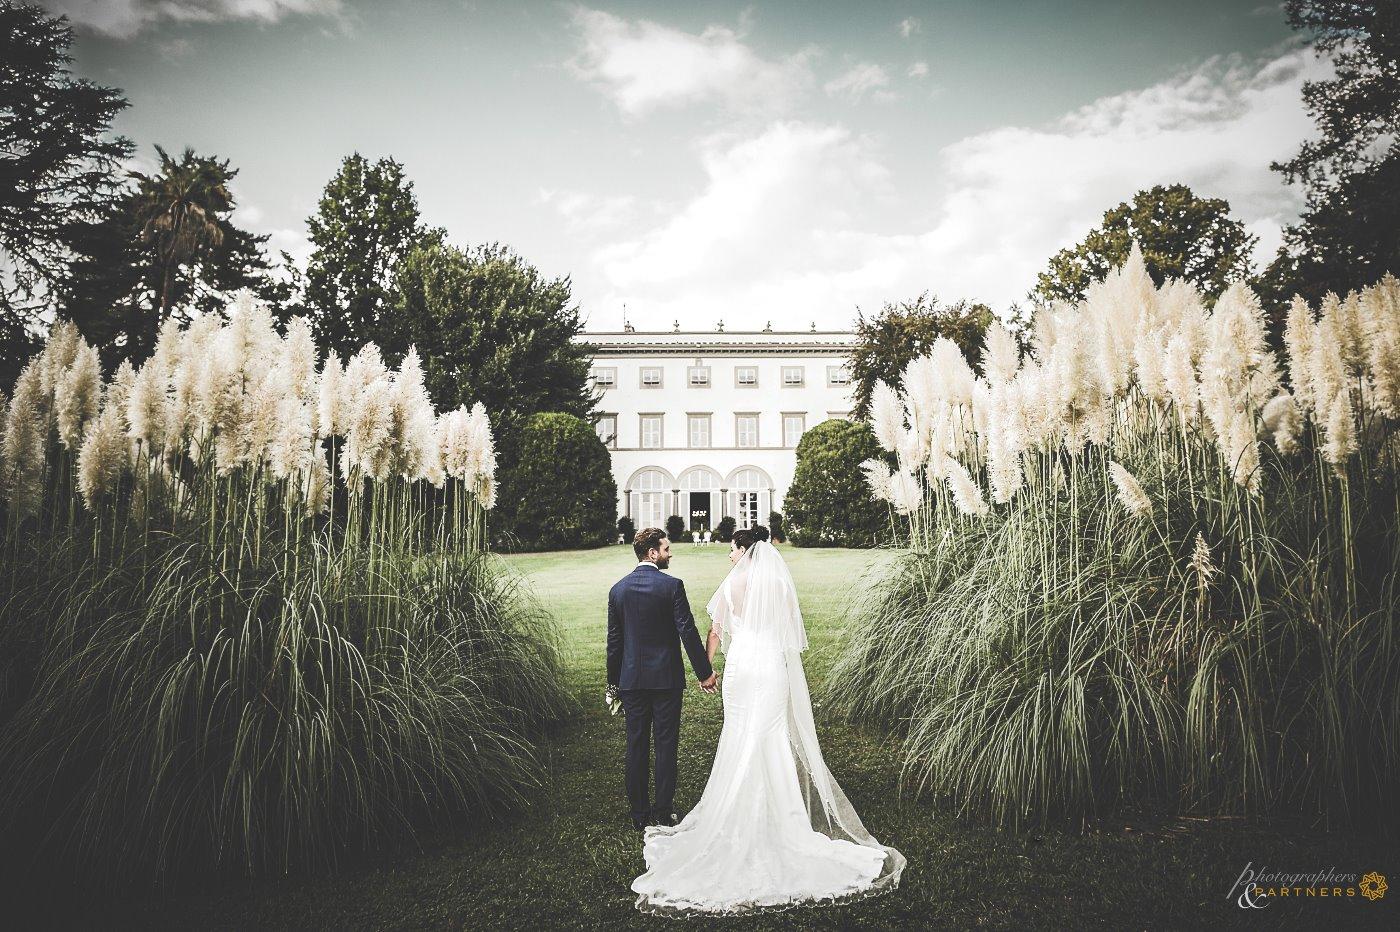 photography_weddings_villa_grabau_13.jpg